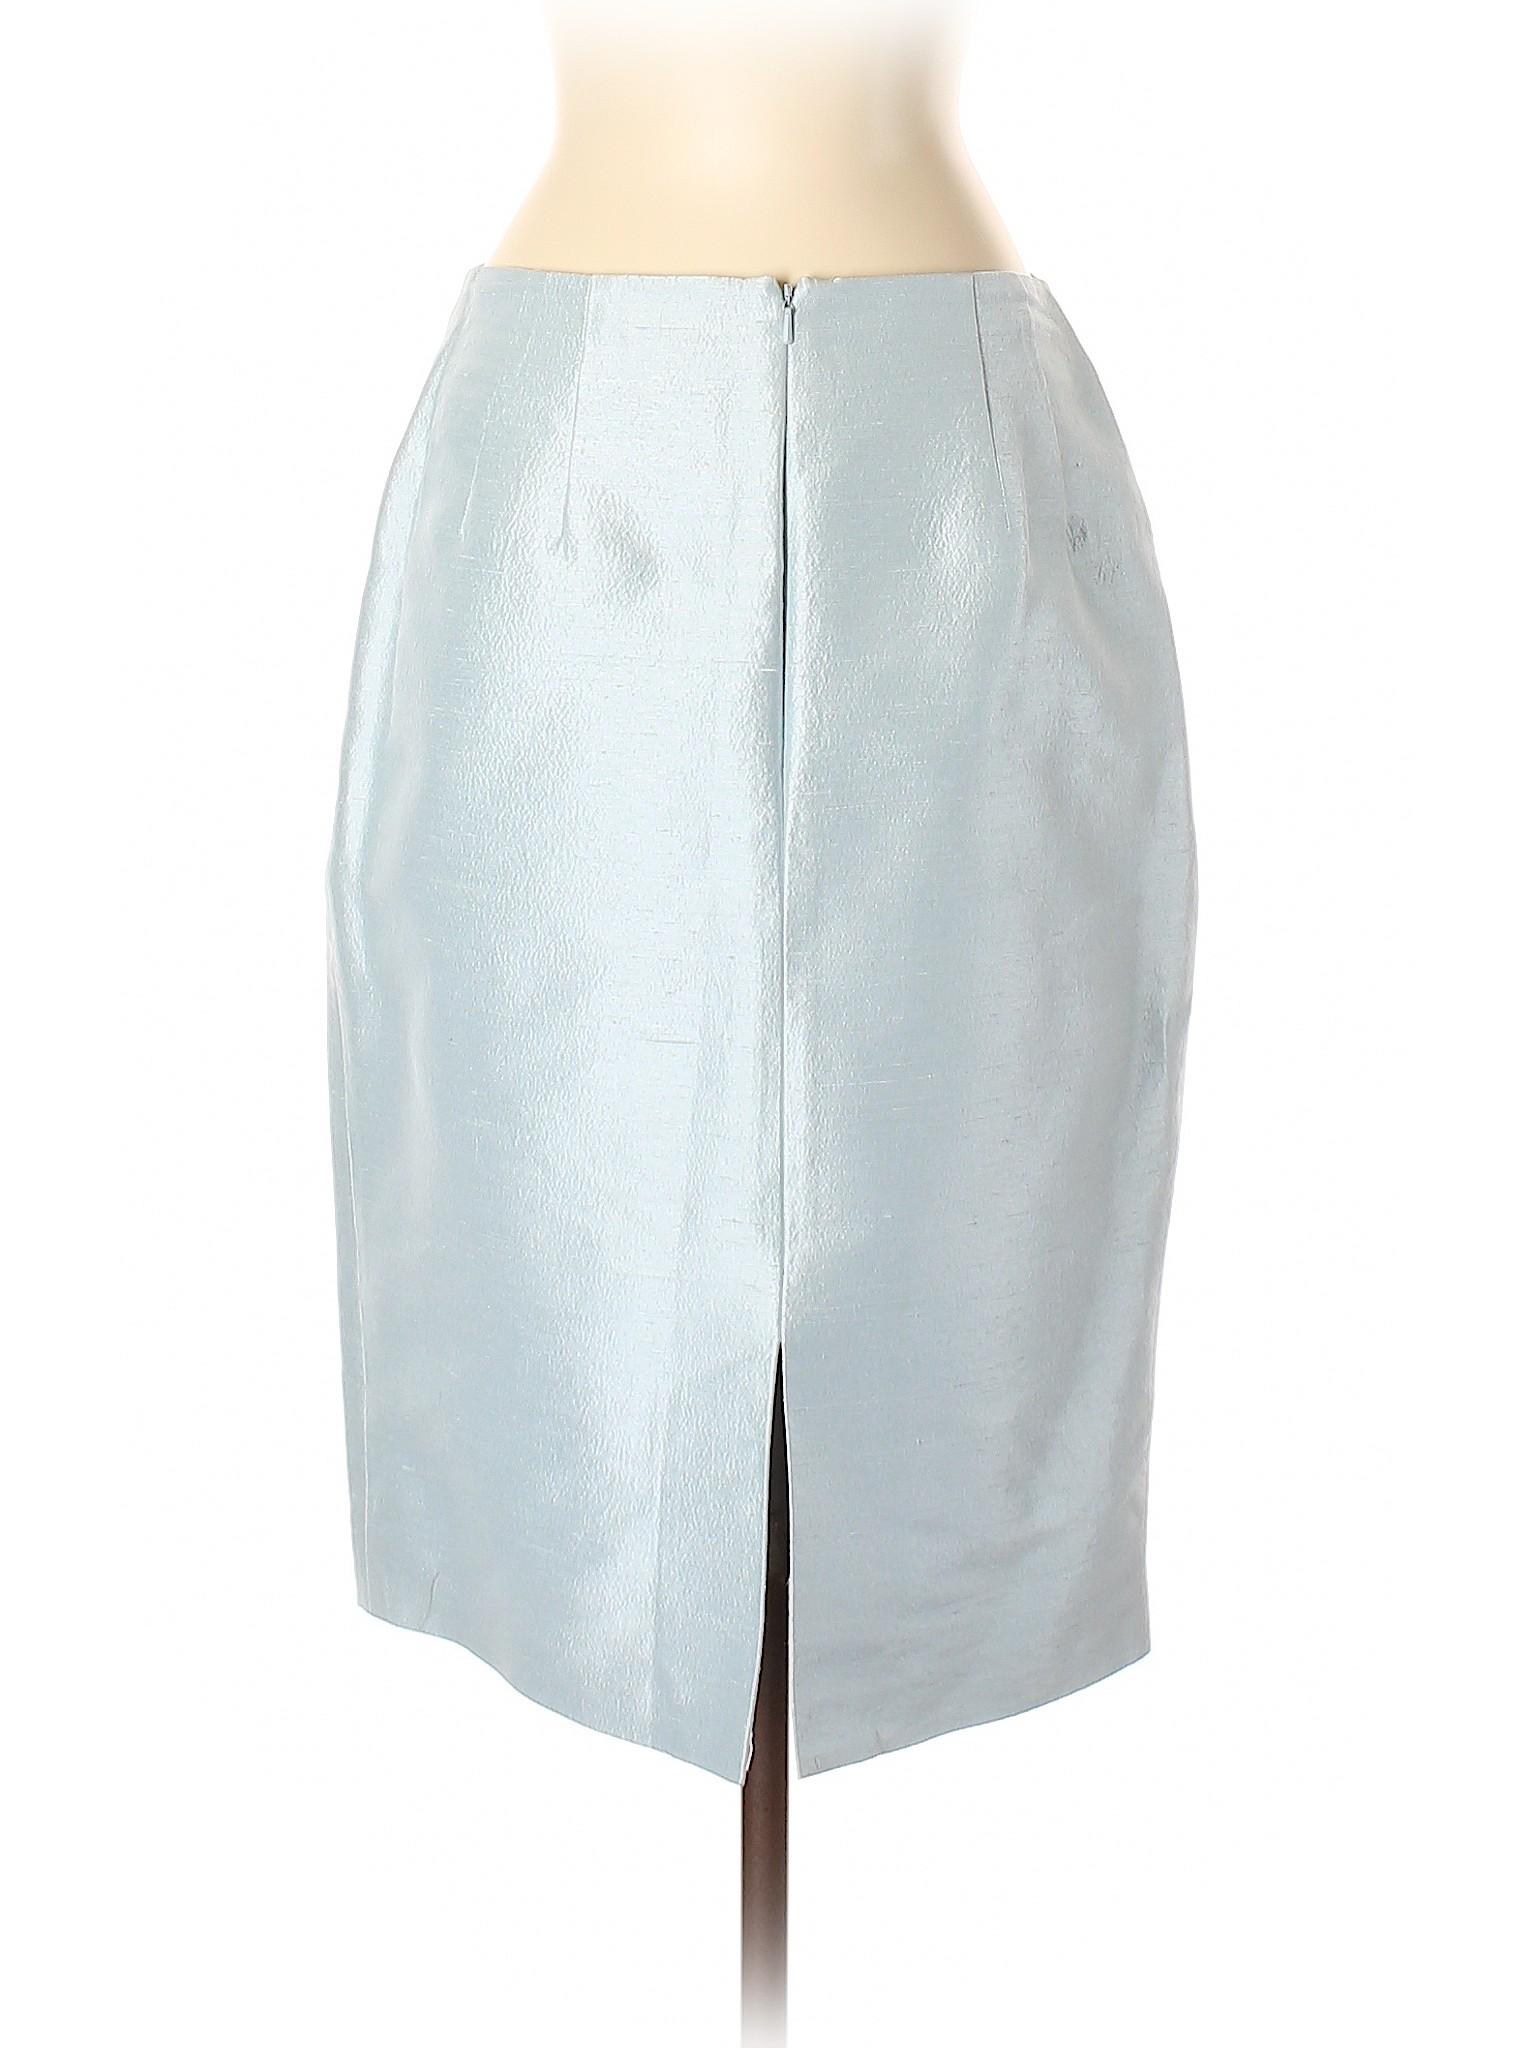 Silk Skirt Boutique Boutique Boutique Silk Skirt Skirt Silk Boutique FqwSd6FU